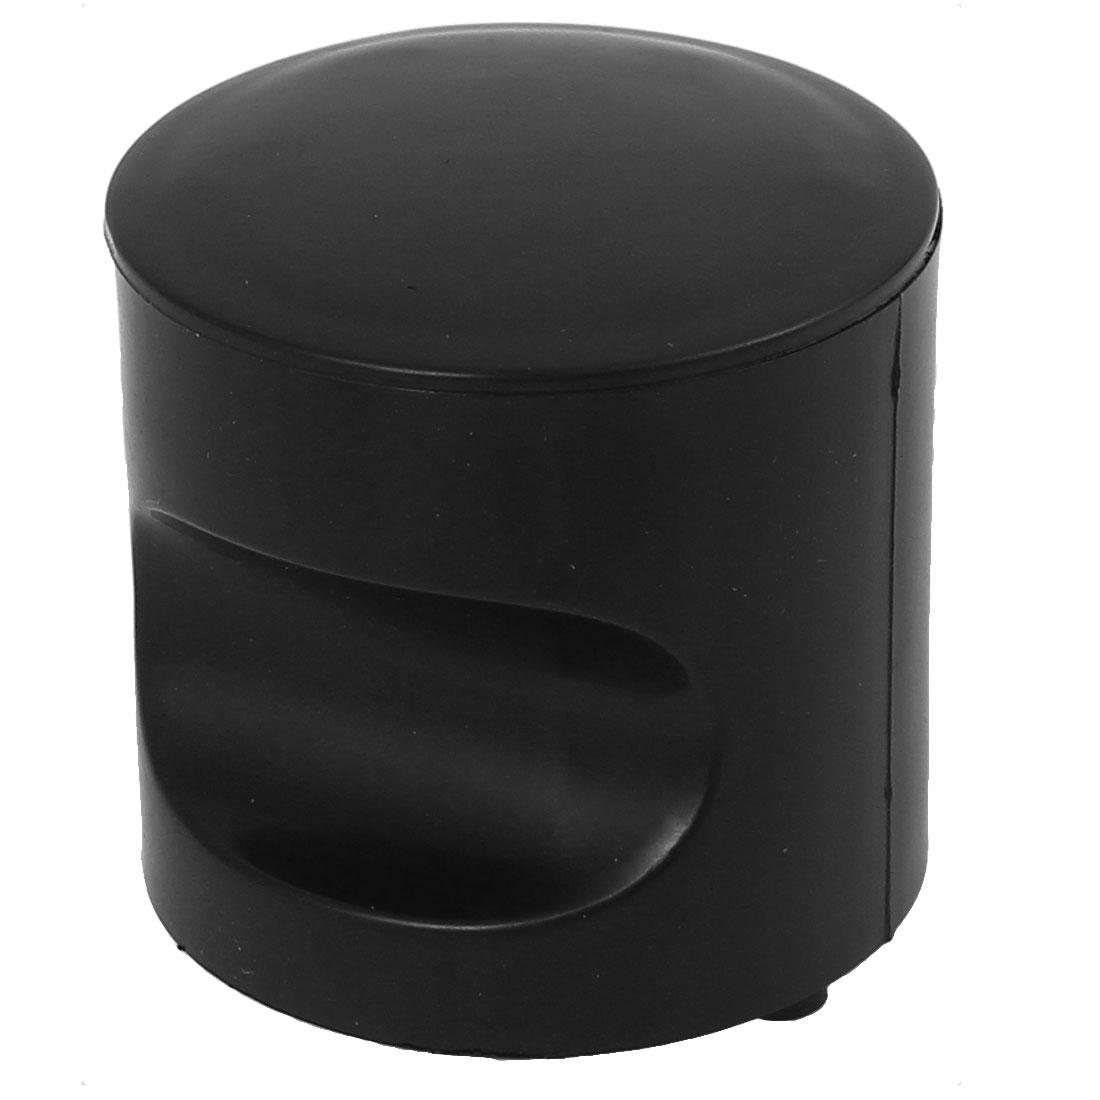 Bathroom Toilet Plastic Door Knob Pull Handle Grip Black